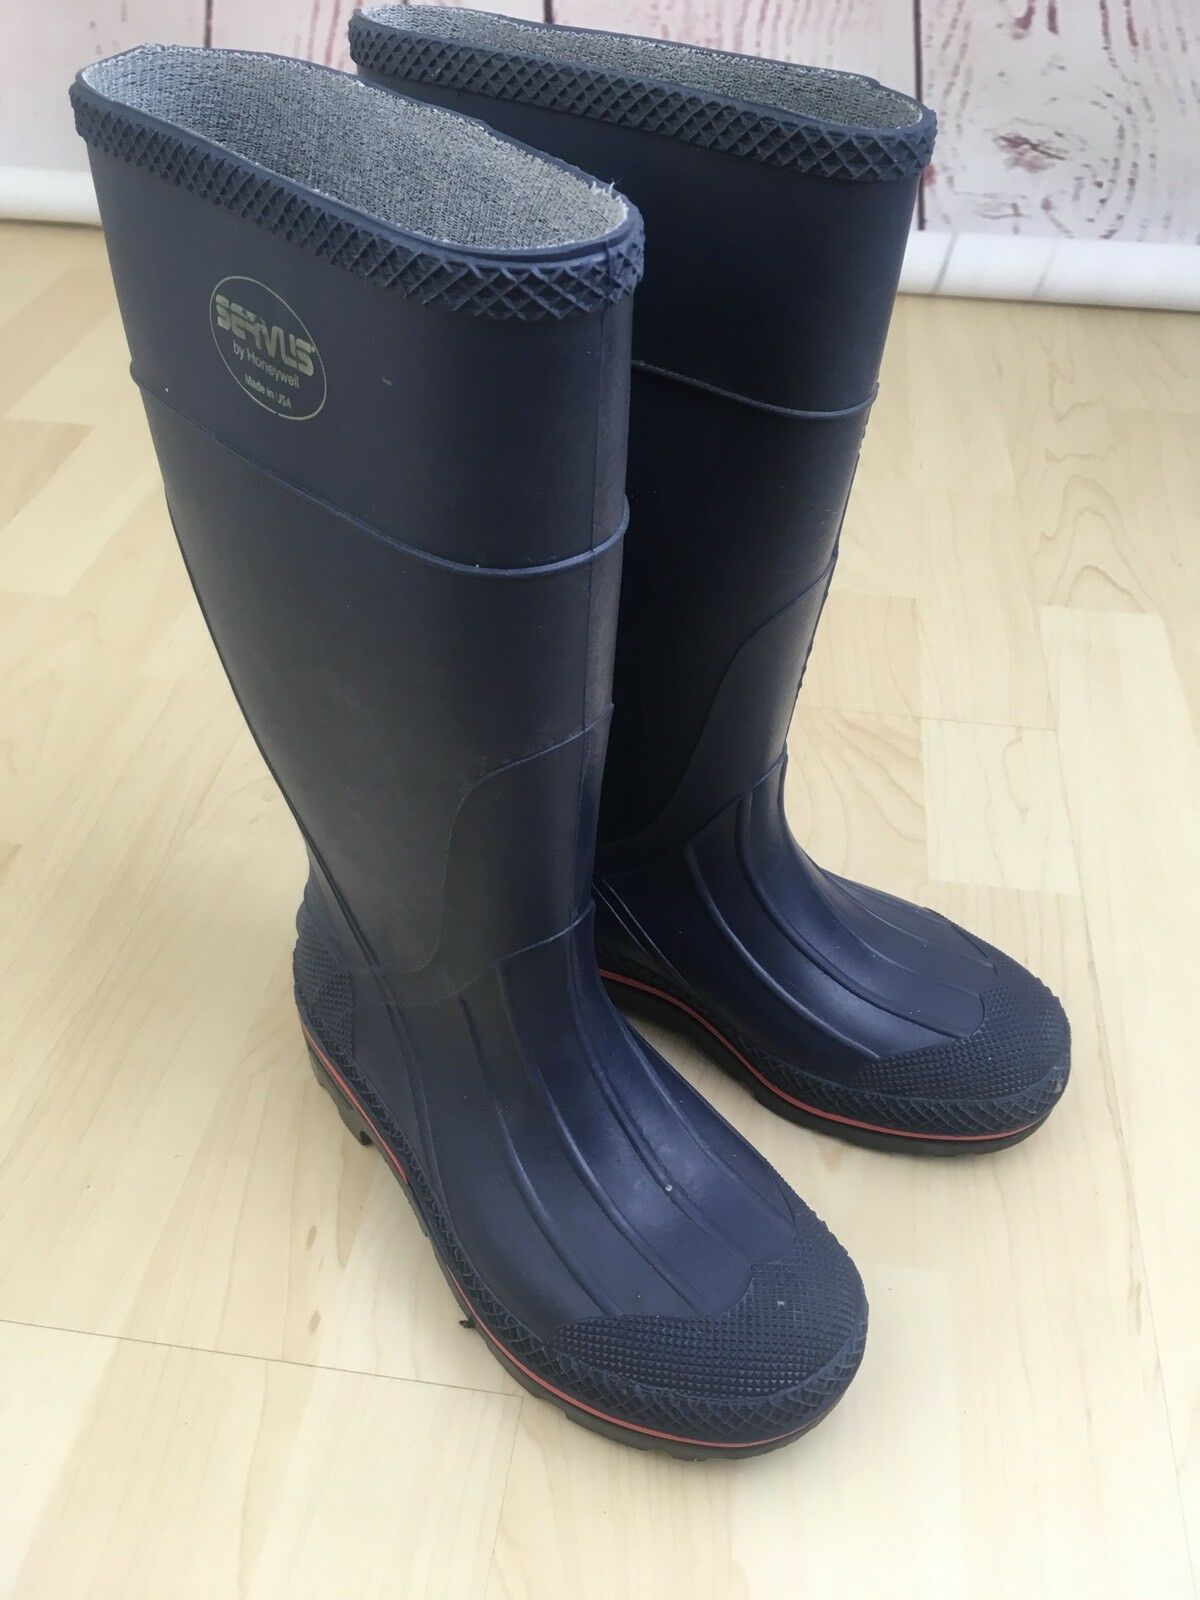 Honeywell Servus Women's Size 5 Knee Rubber Boots Navy bluee